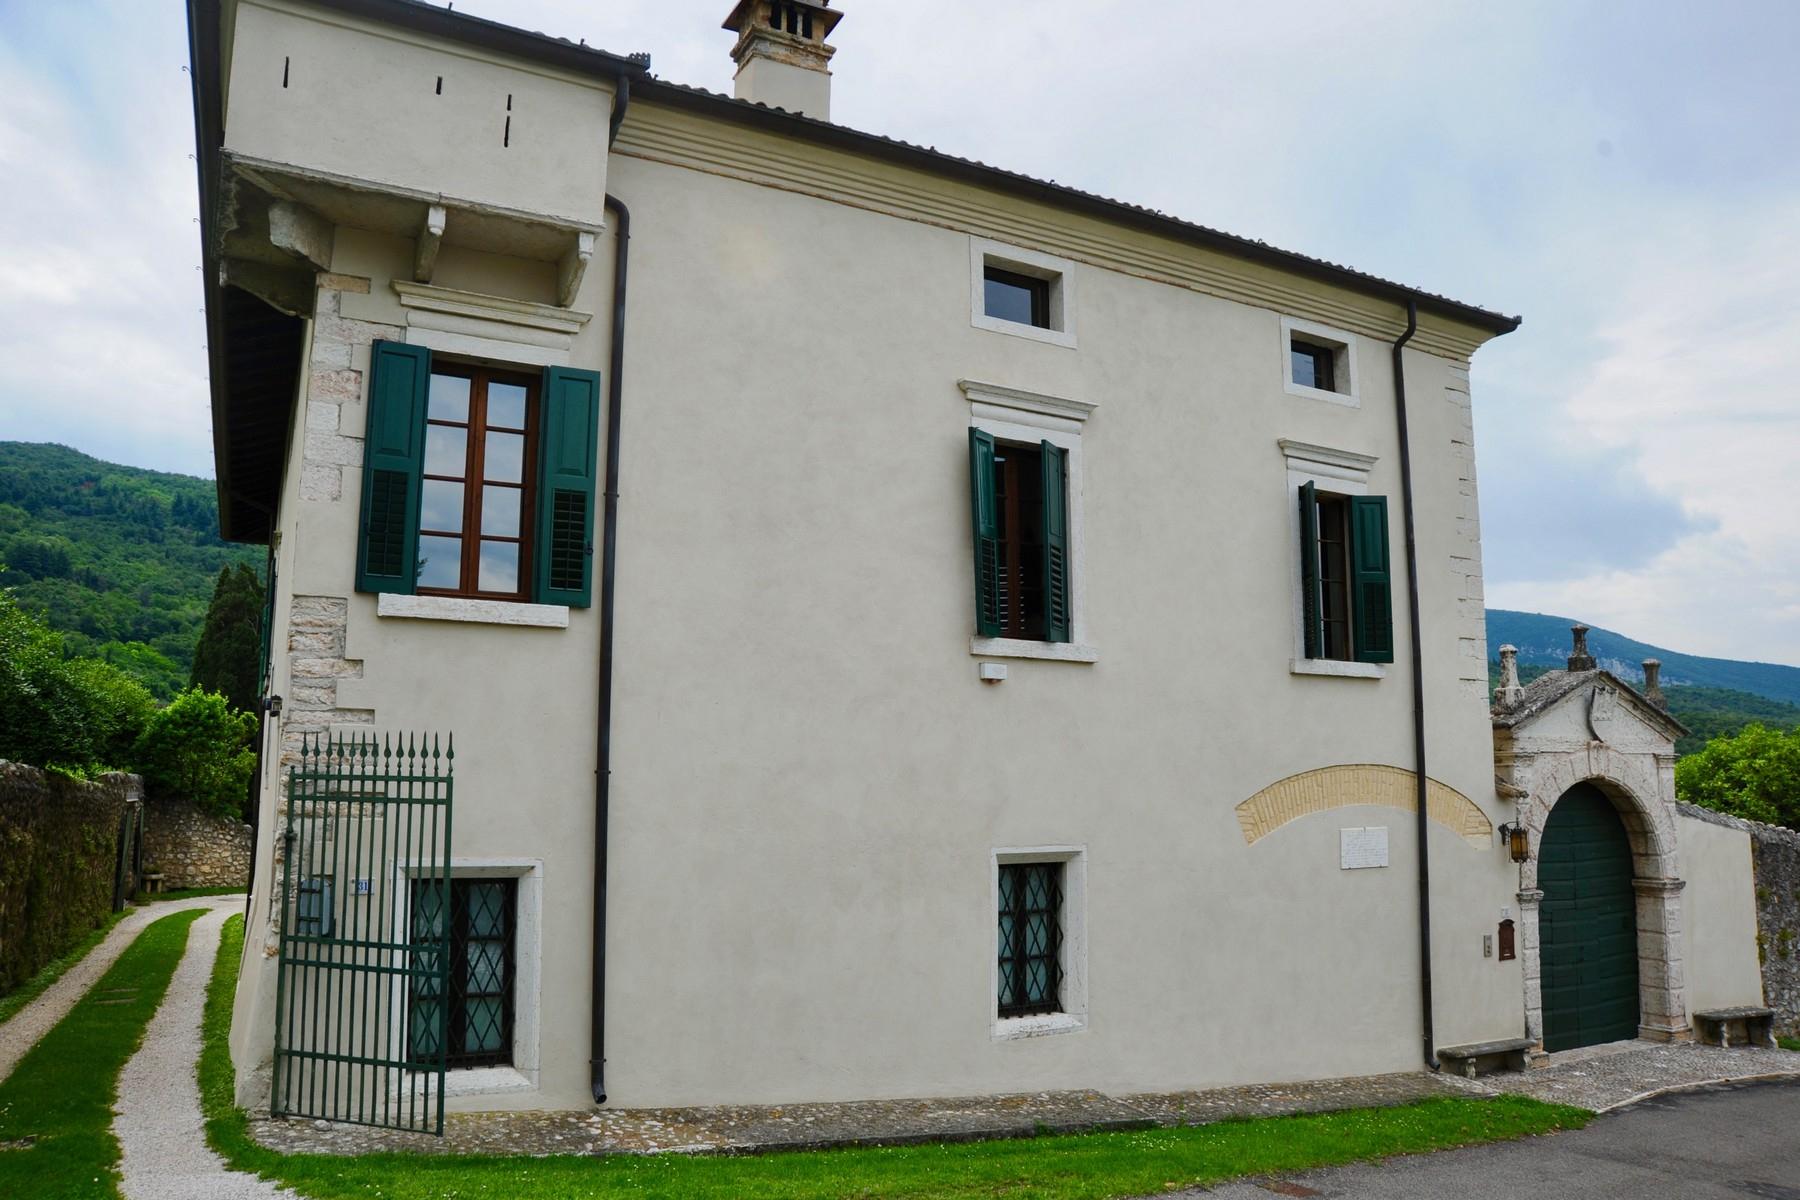 Villa in Vendita a Verona: 5 locali, 450 mq - Foto 2